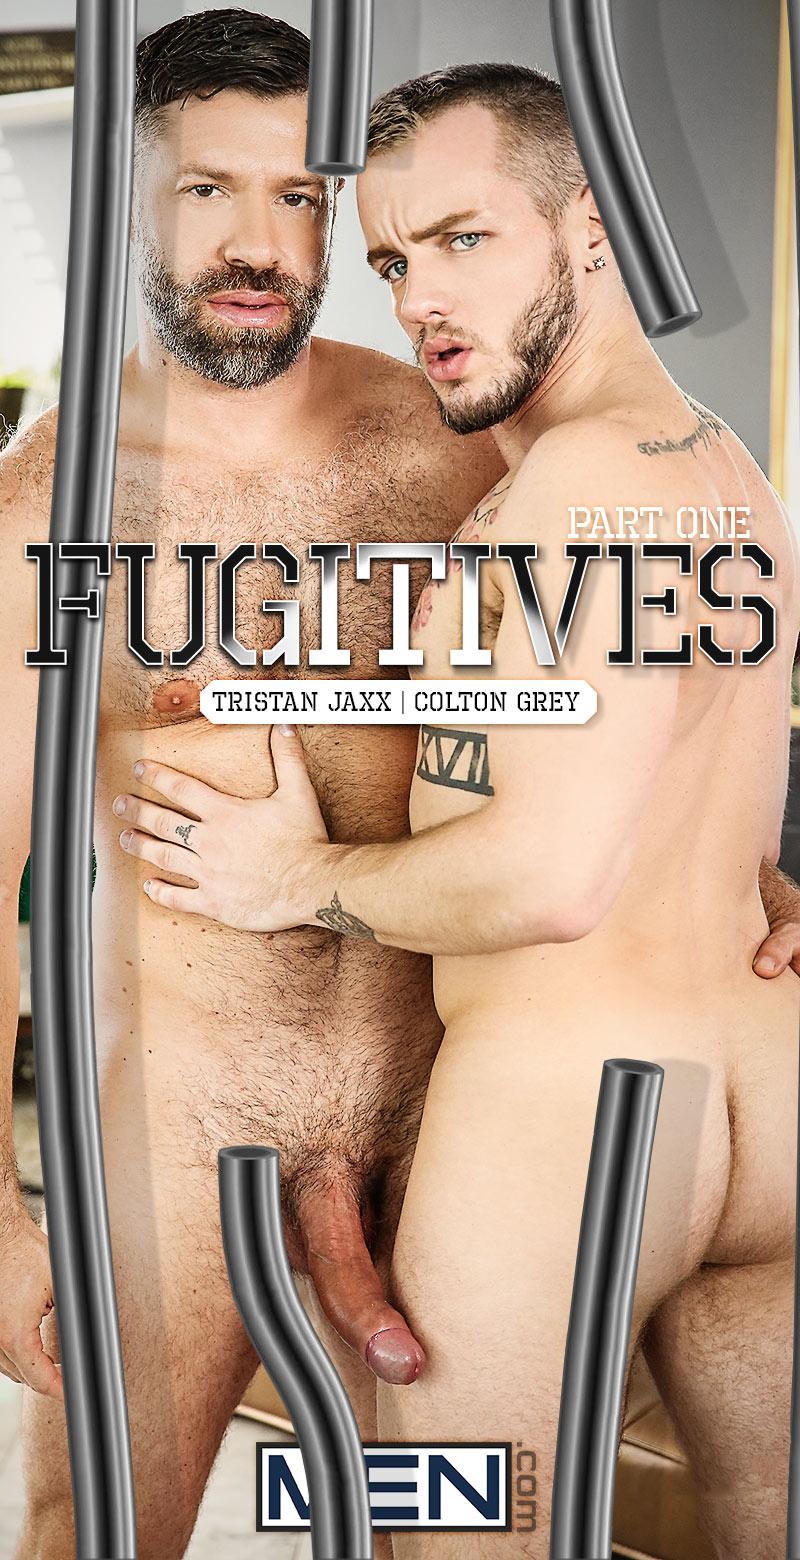 Fugitives, Part 1 (Tristan Jaxx Fucks Colton Grey) at Str8 To Gay